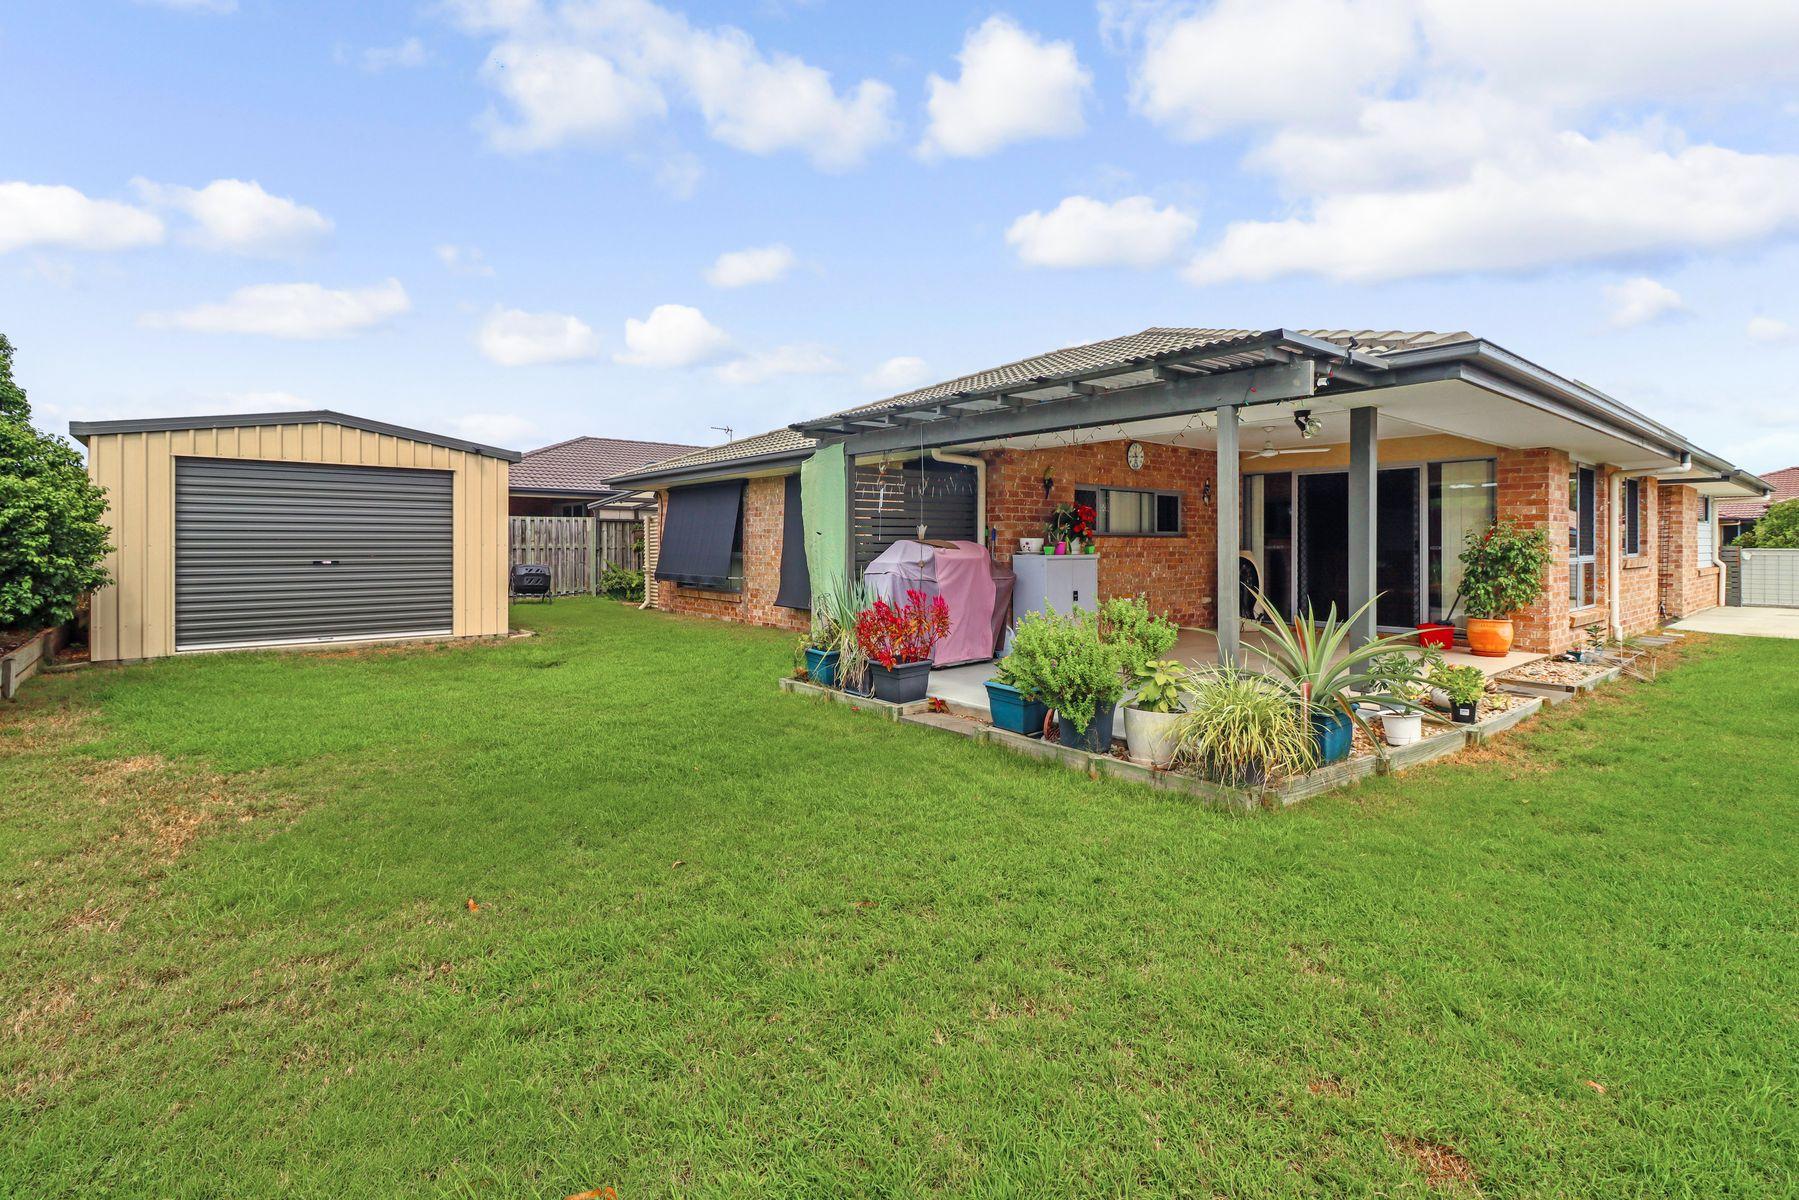 21 Mawson Court, Urraween, QLD 4655